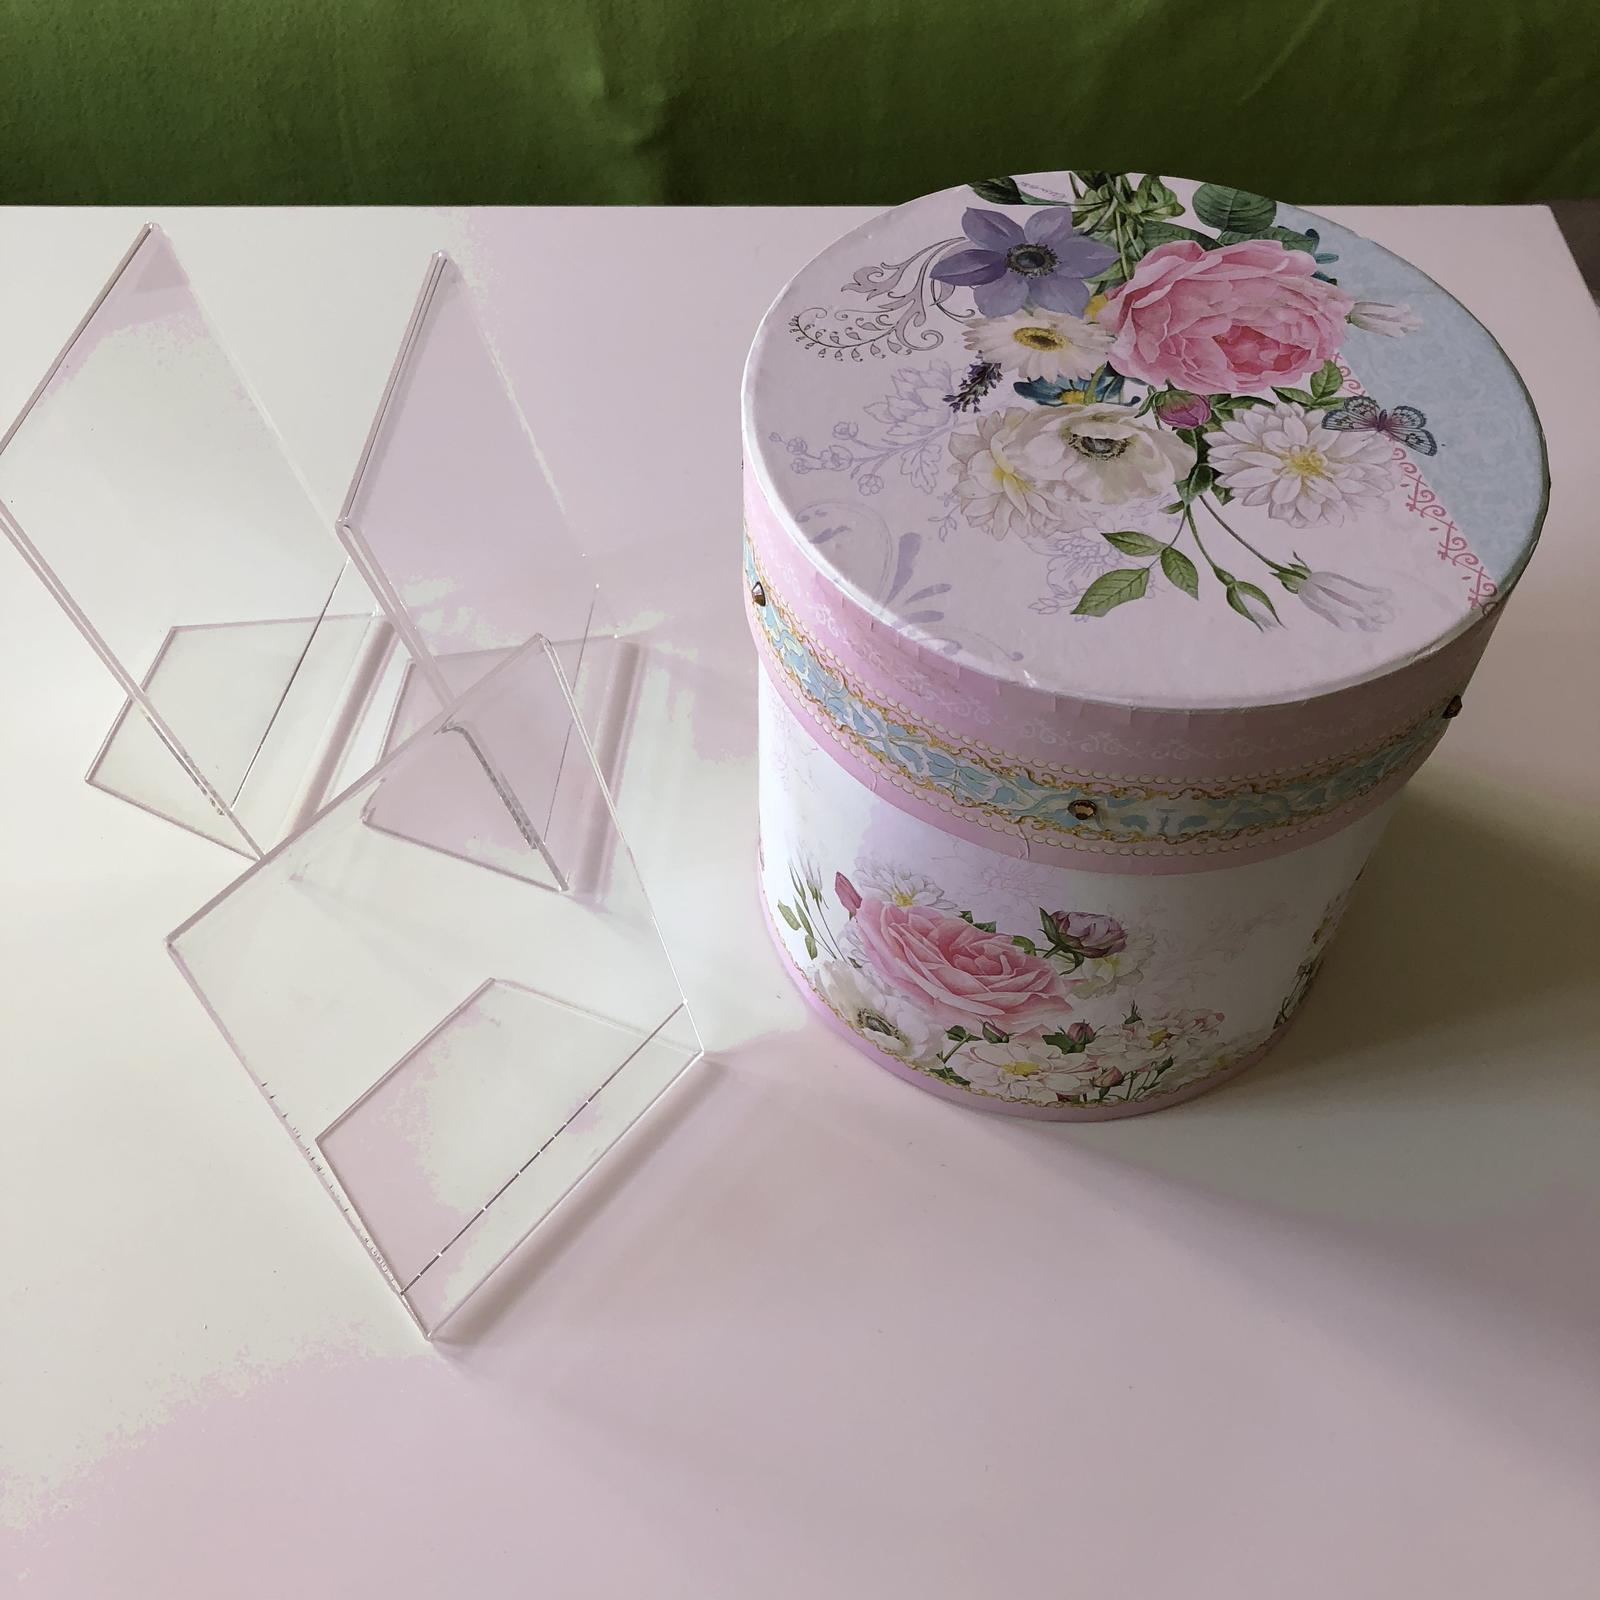 Kulatá romantická krabice - Obrázek č. 2